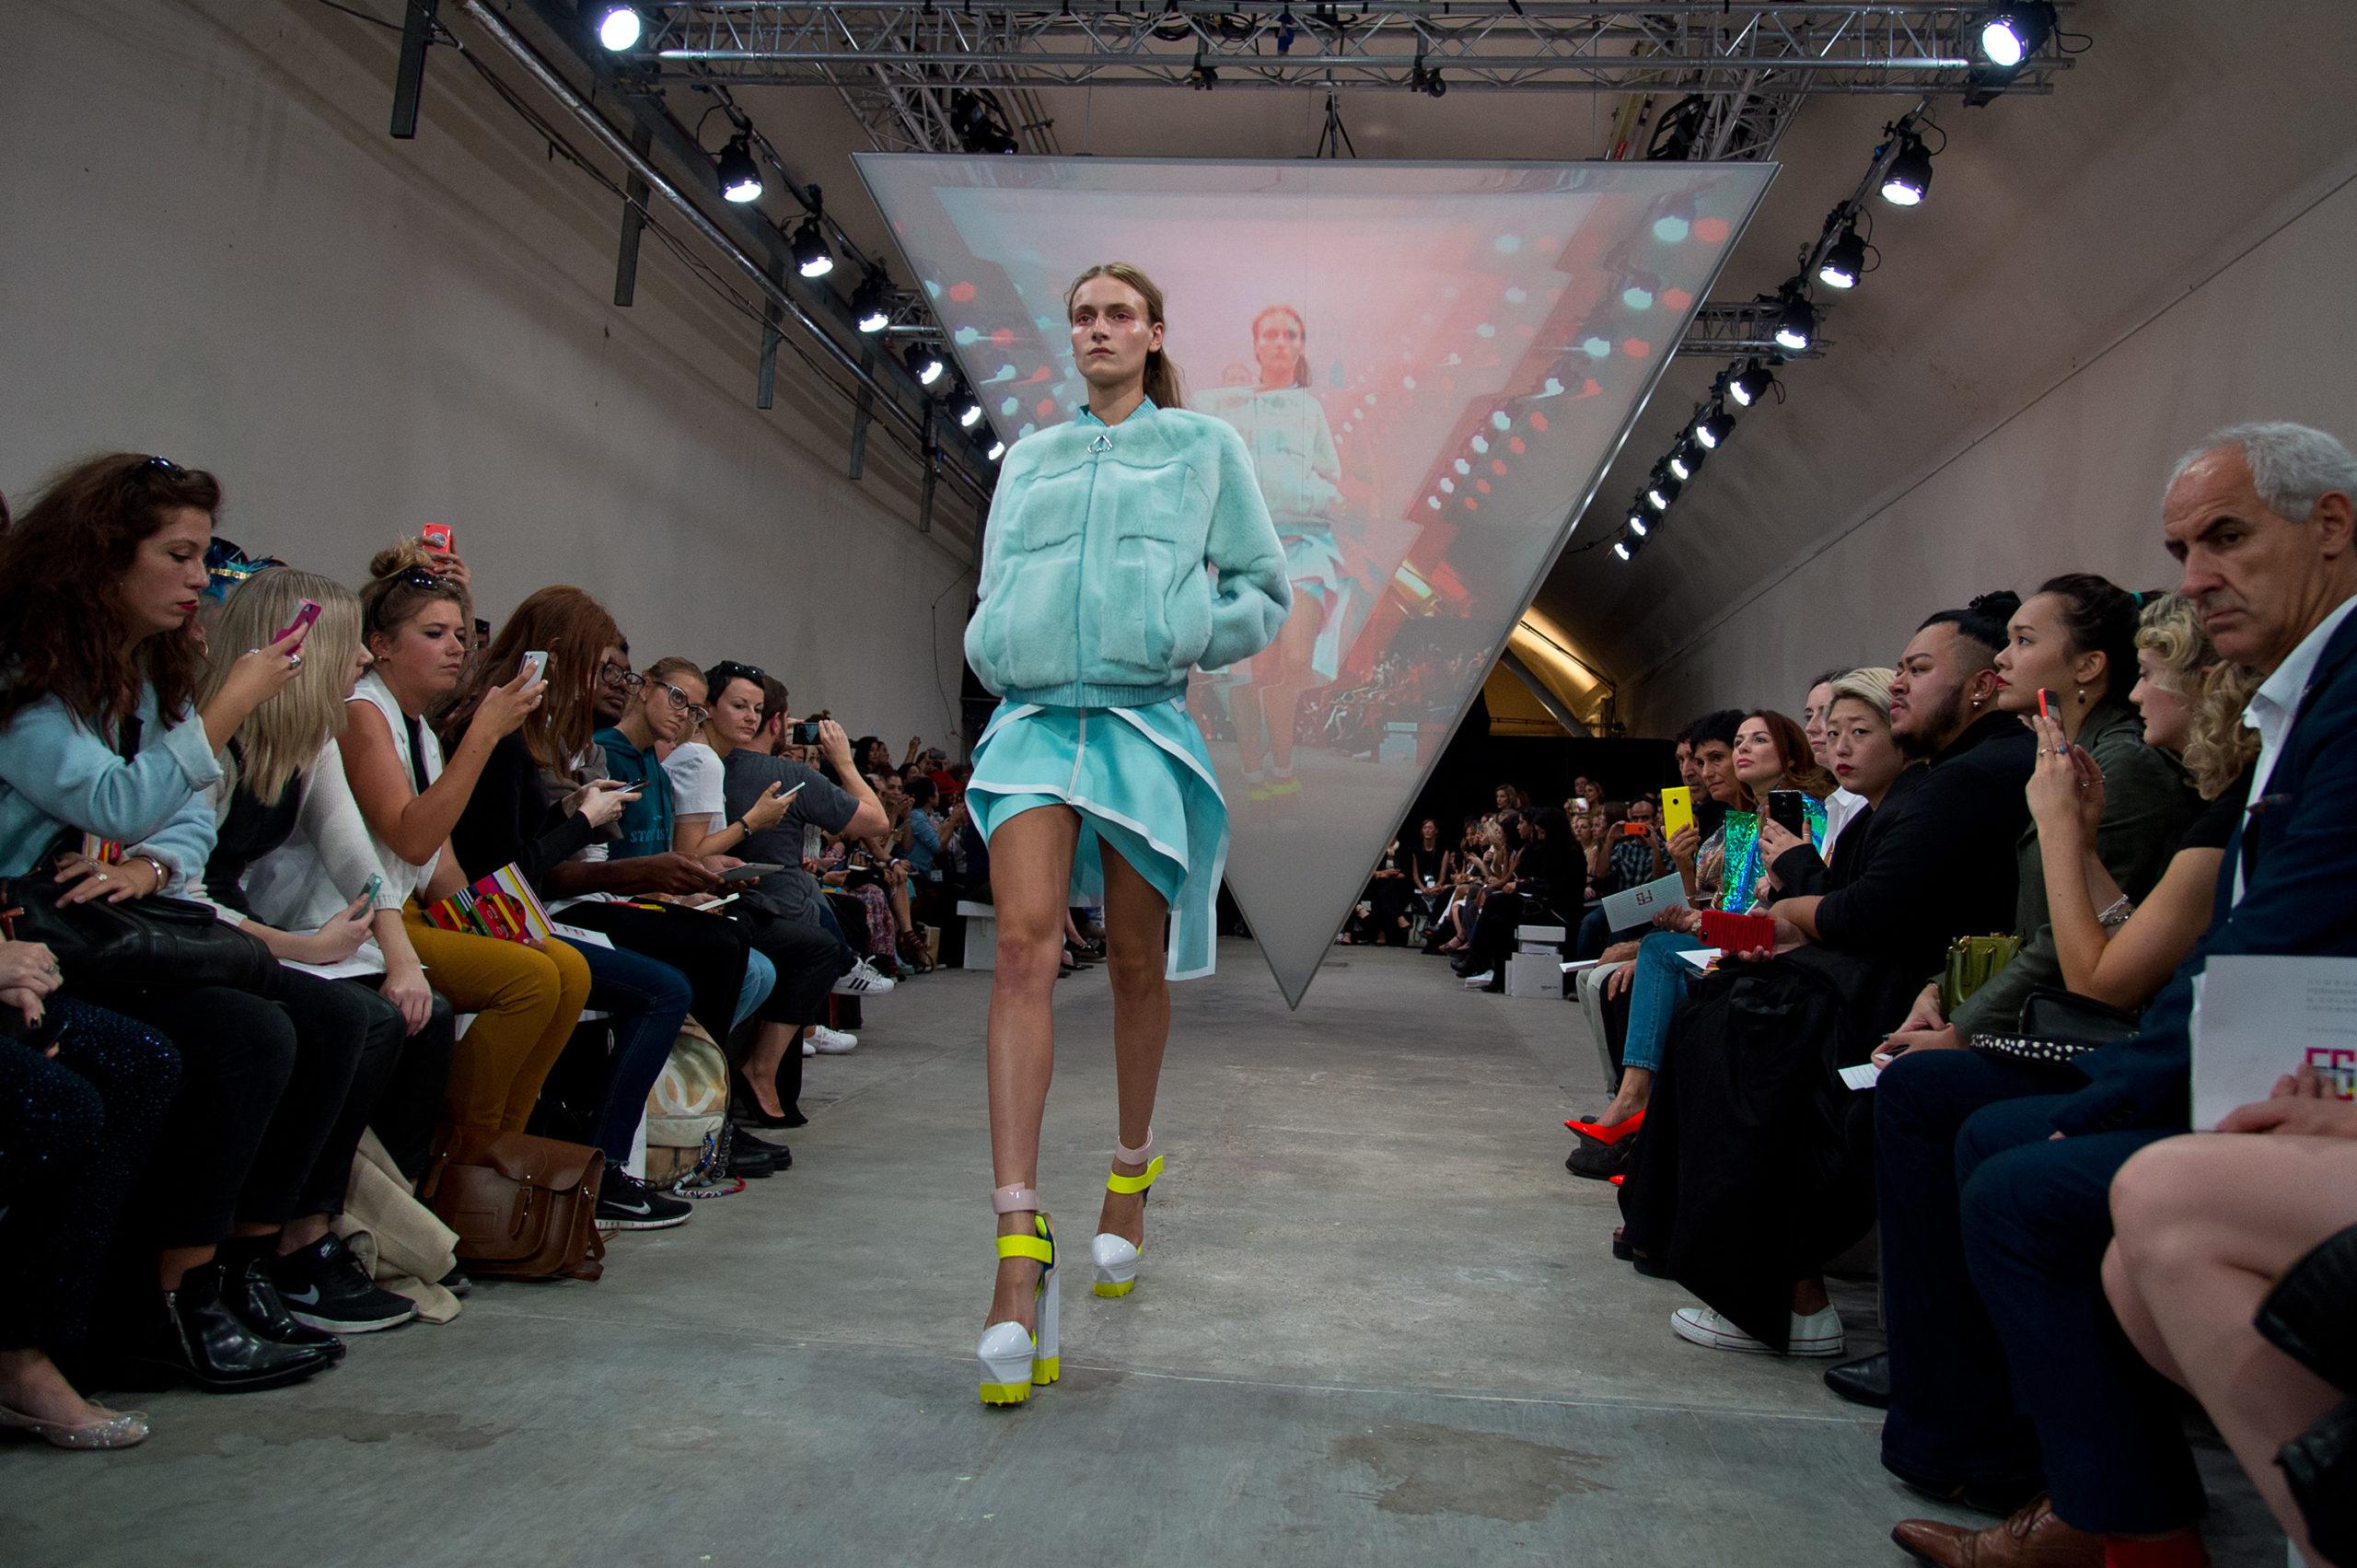 Model walking down catwalk for Fyodor Golan SS15 show, Fashion Innovation Agency